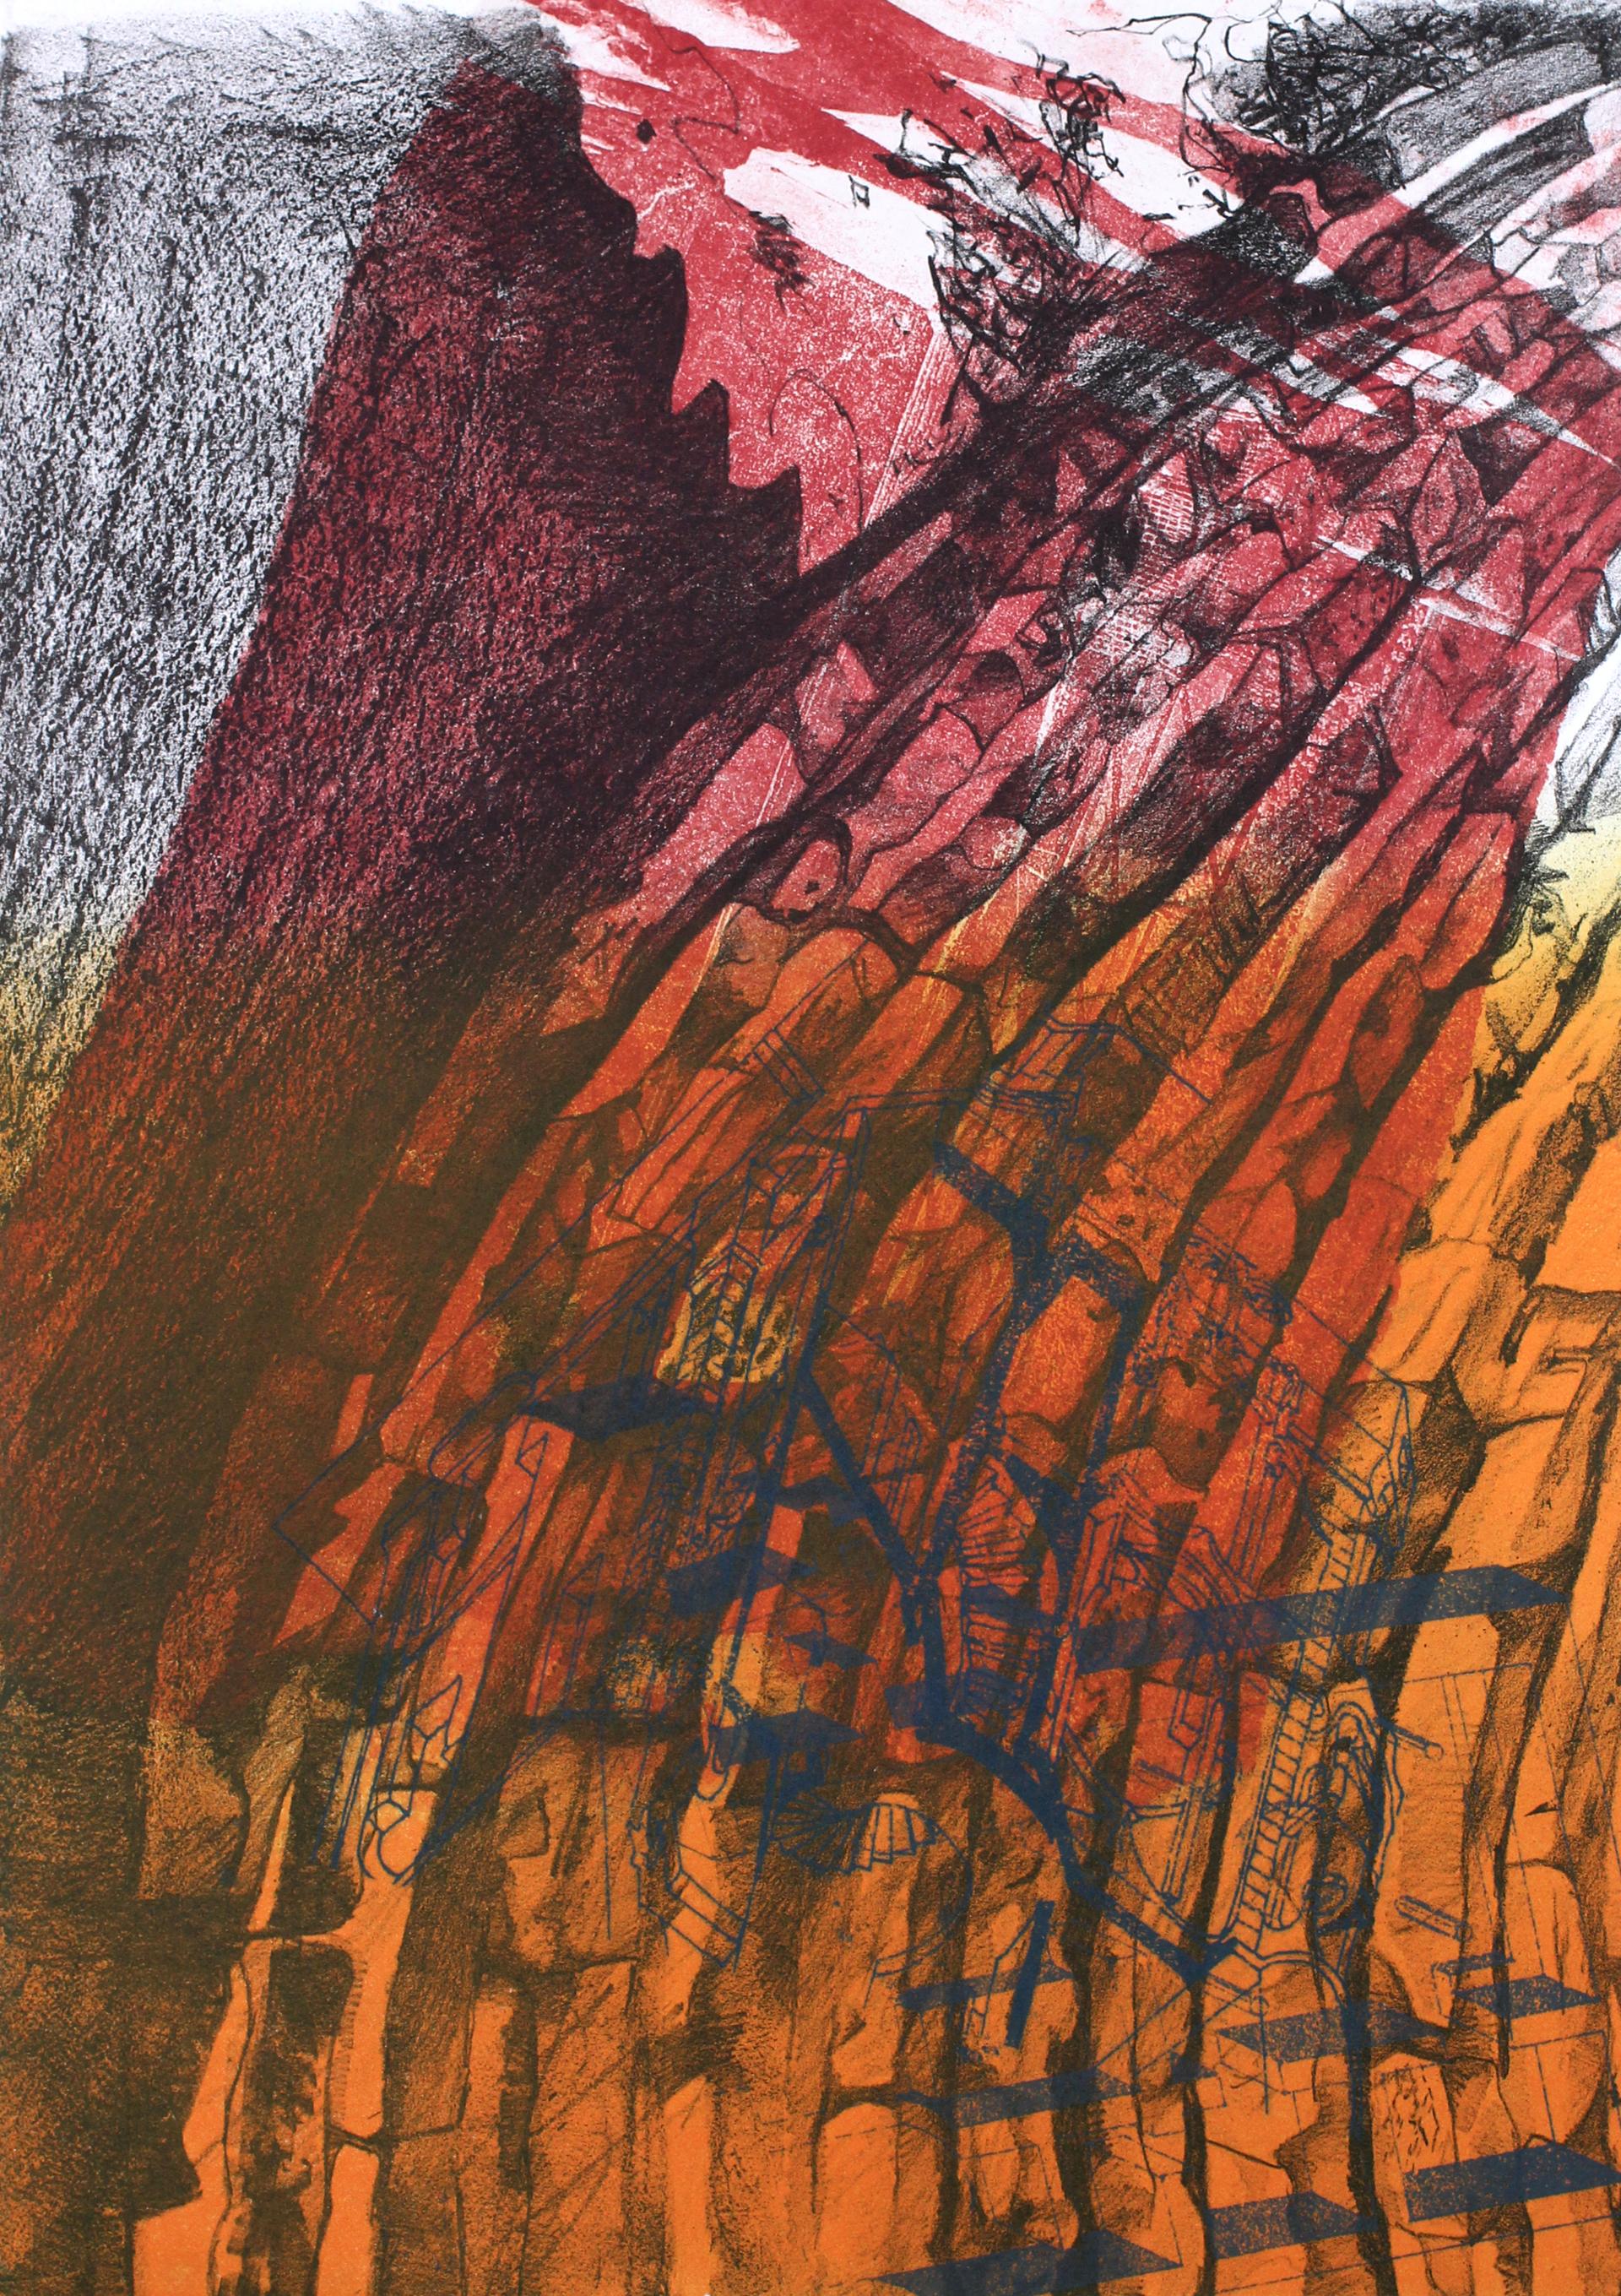 """Site LIV"" by Seth Daulton"